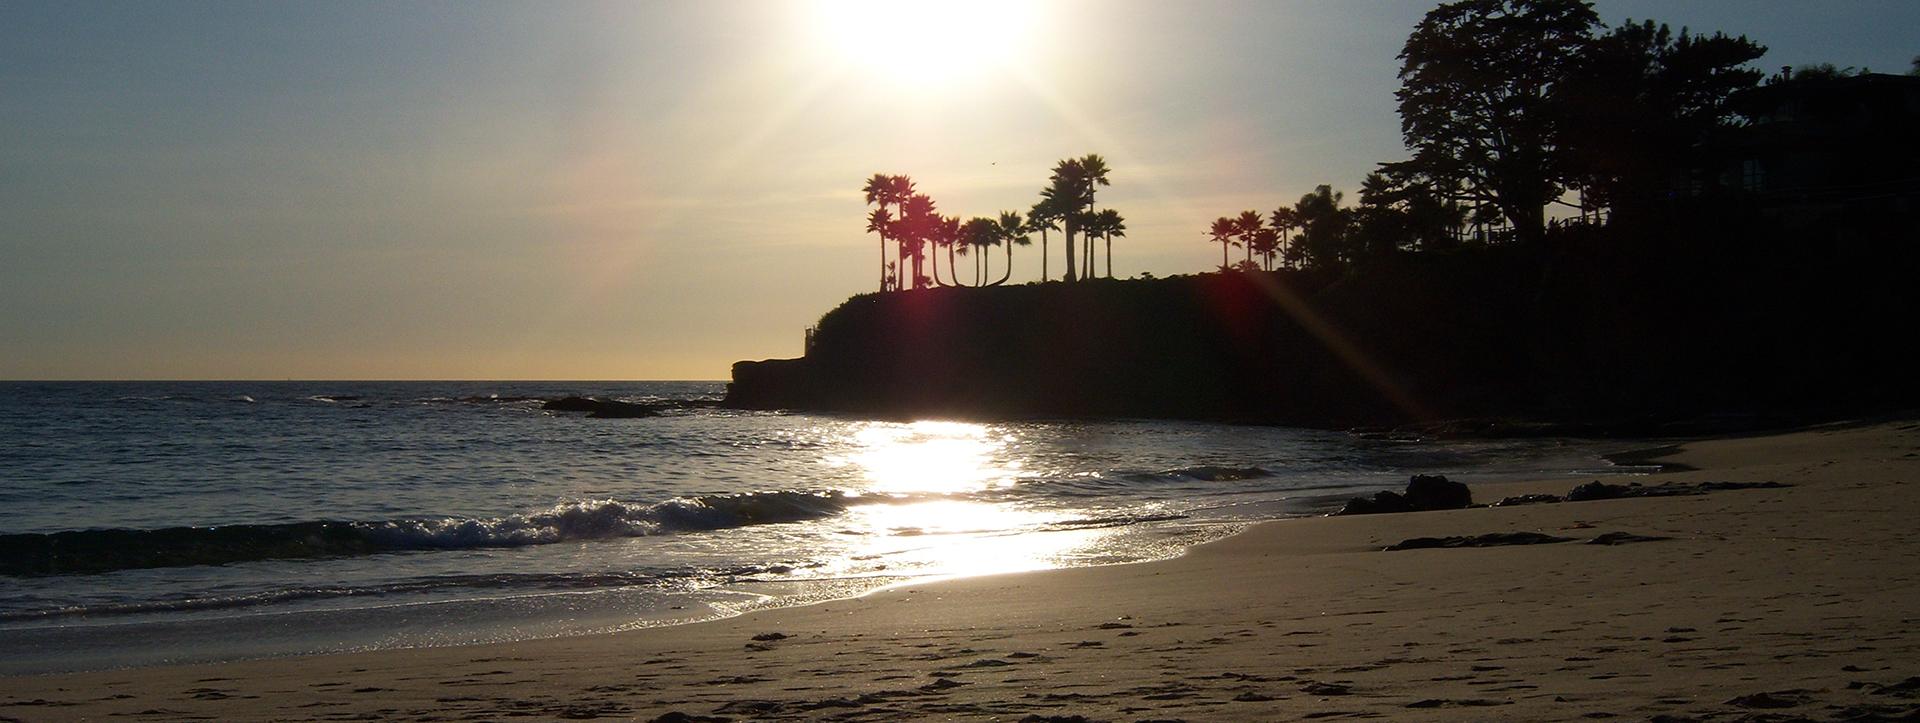 Beach-Sunset_0910-W